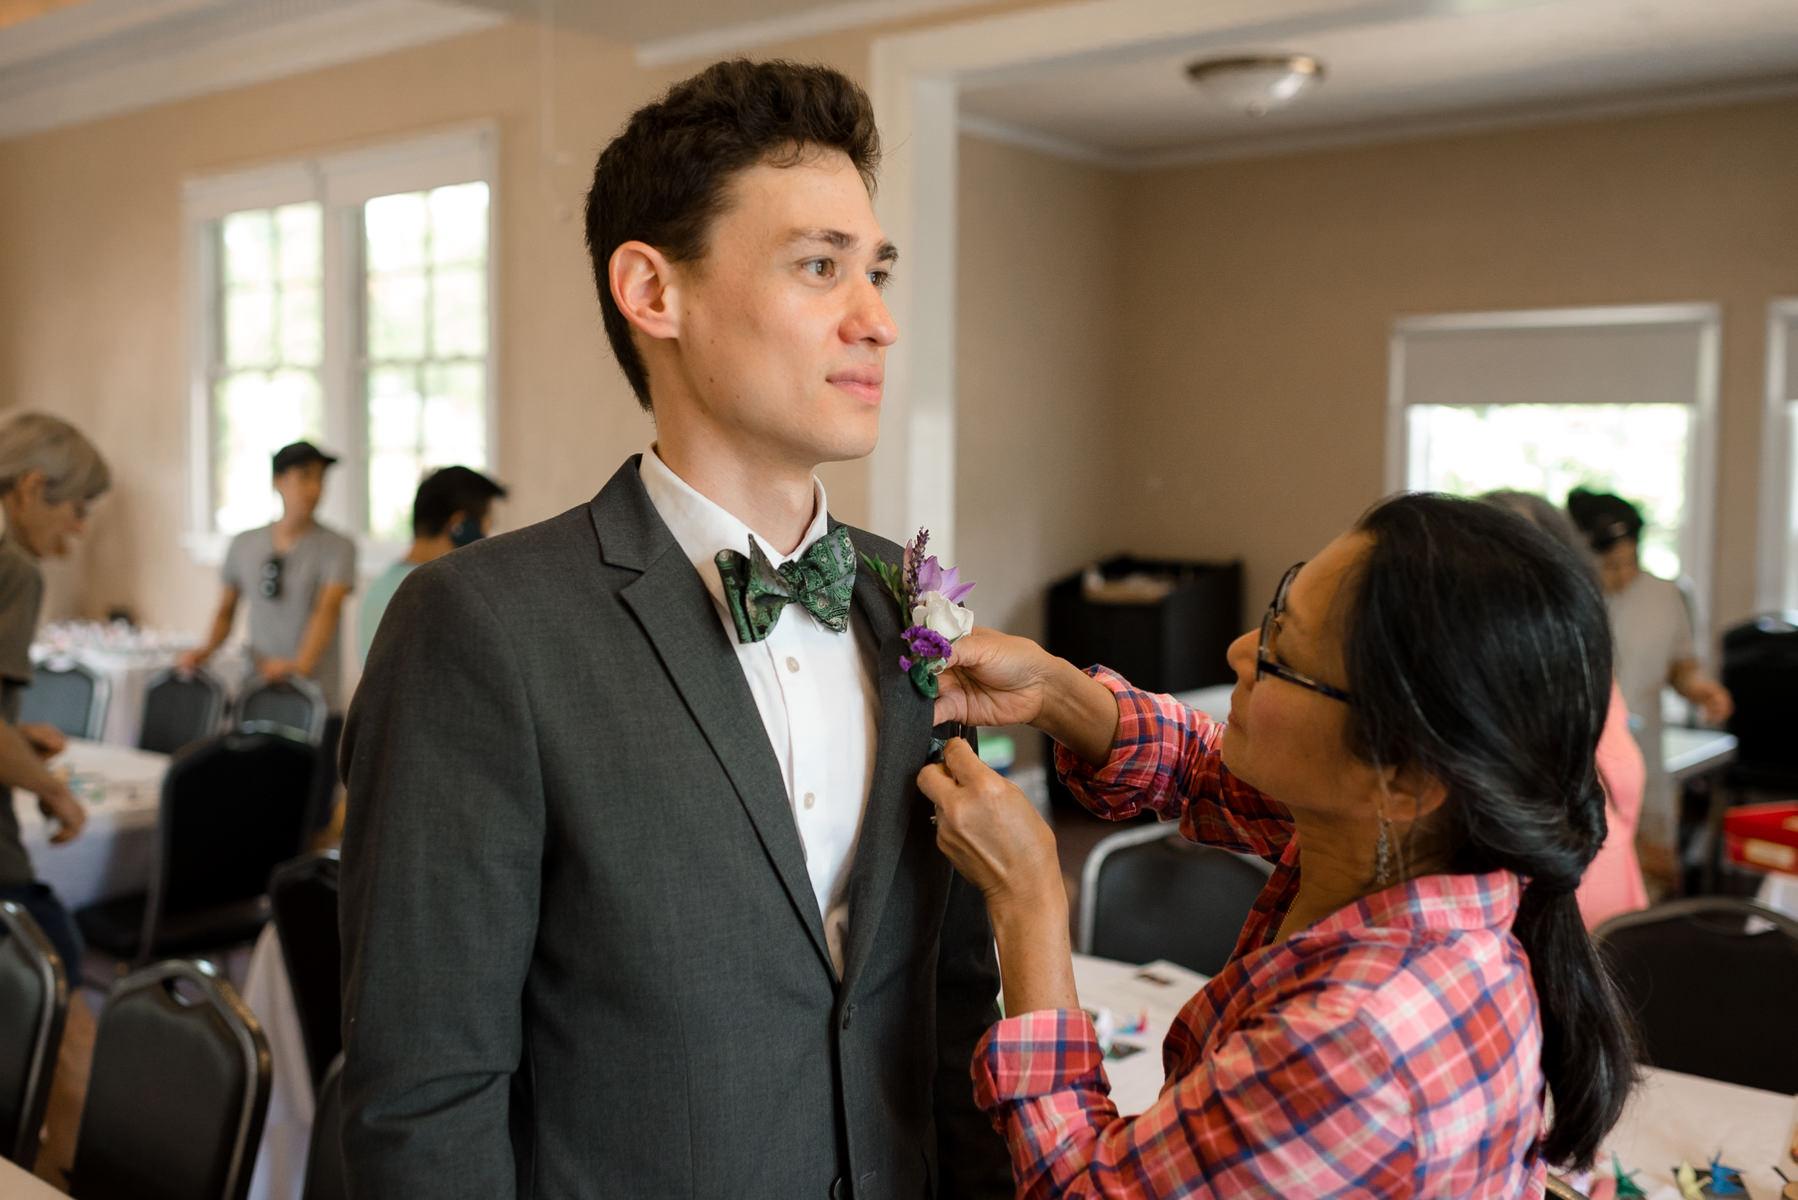 Andrew Tat - Documentary Wedding Photography - Heritage Hall - Kirkland, Washington - Grace & James - 07.JPG